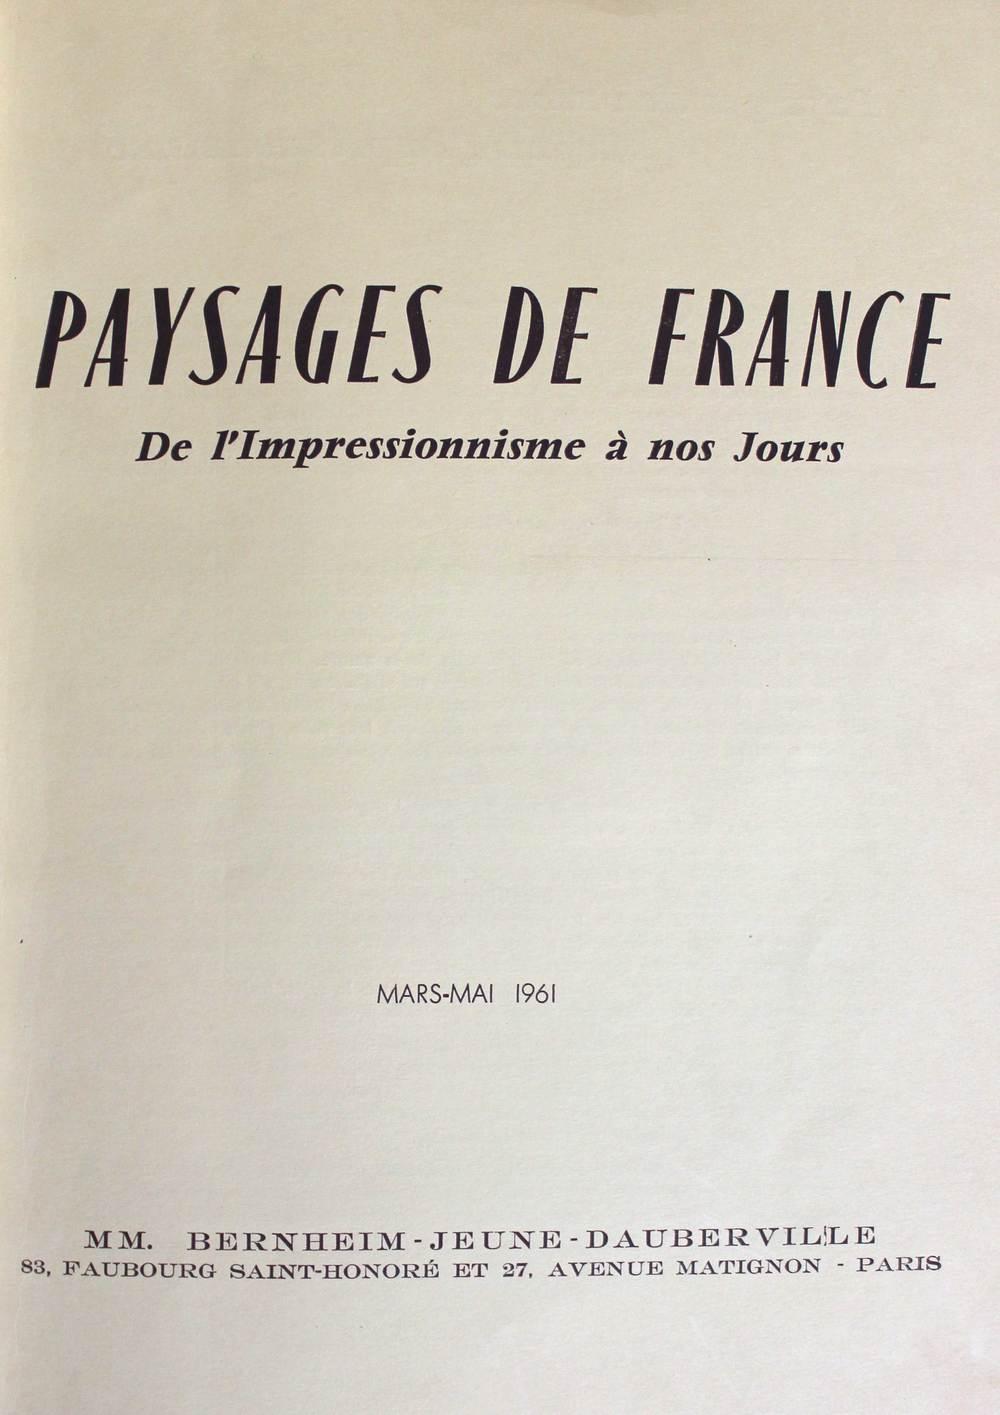 Paysage-de-France.jpg